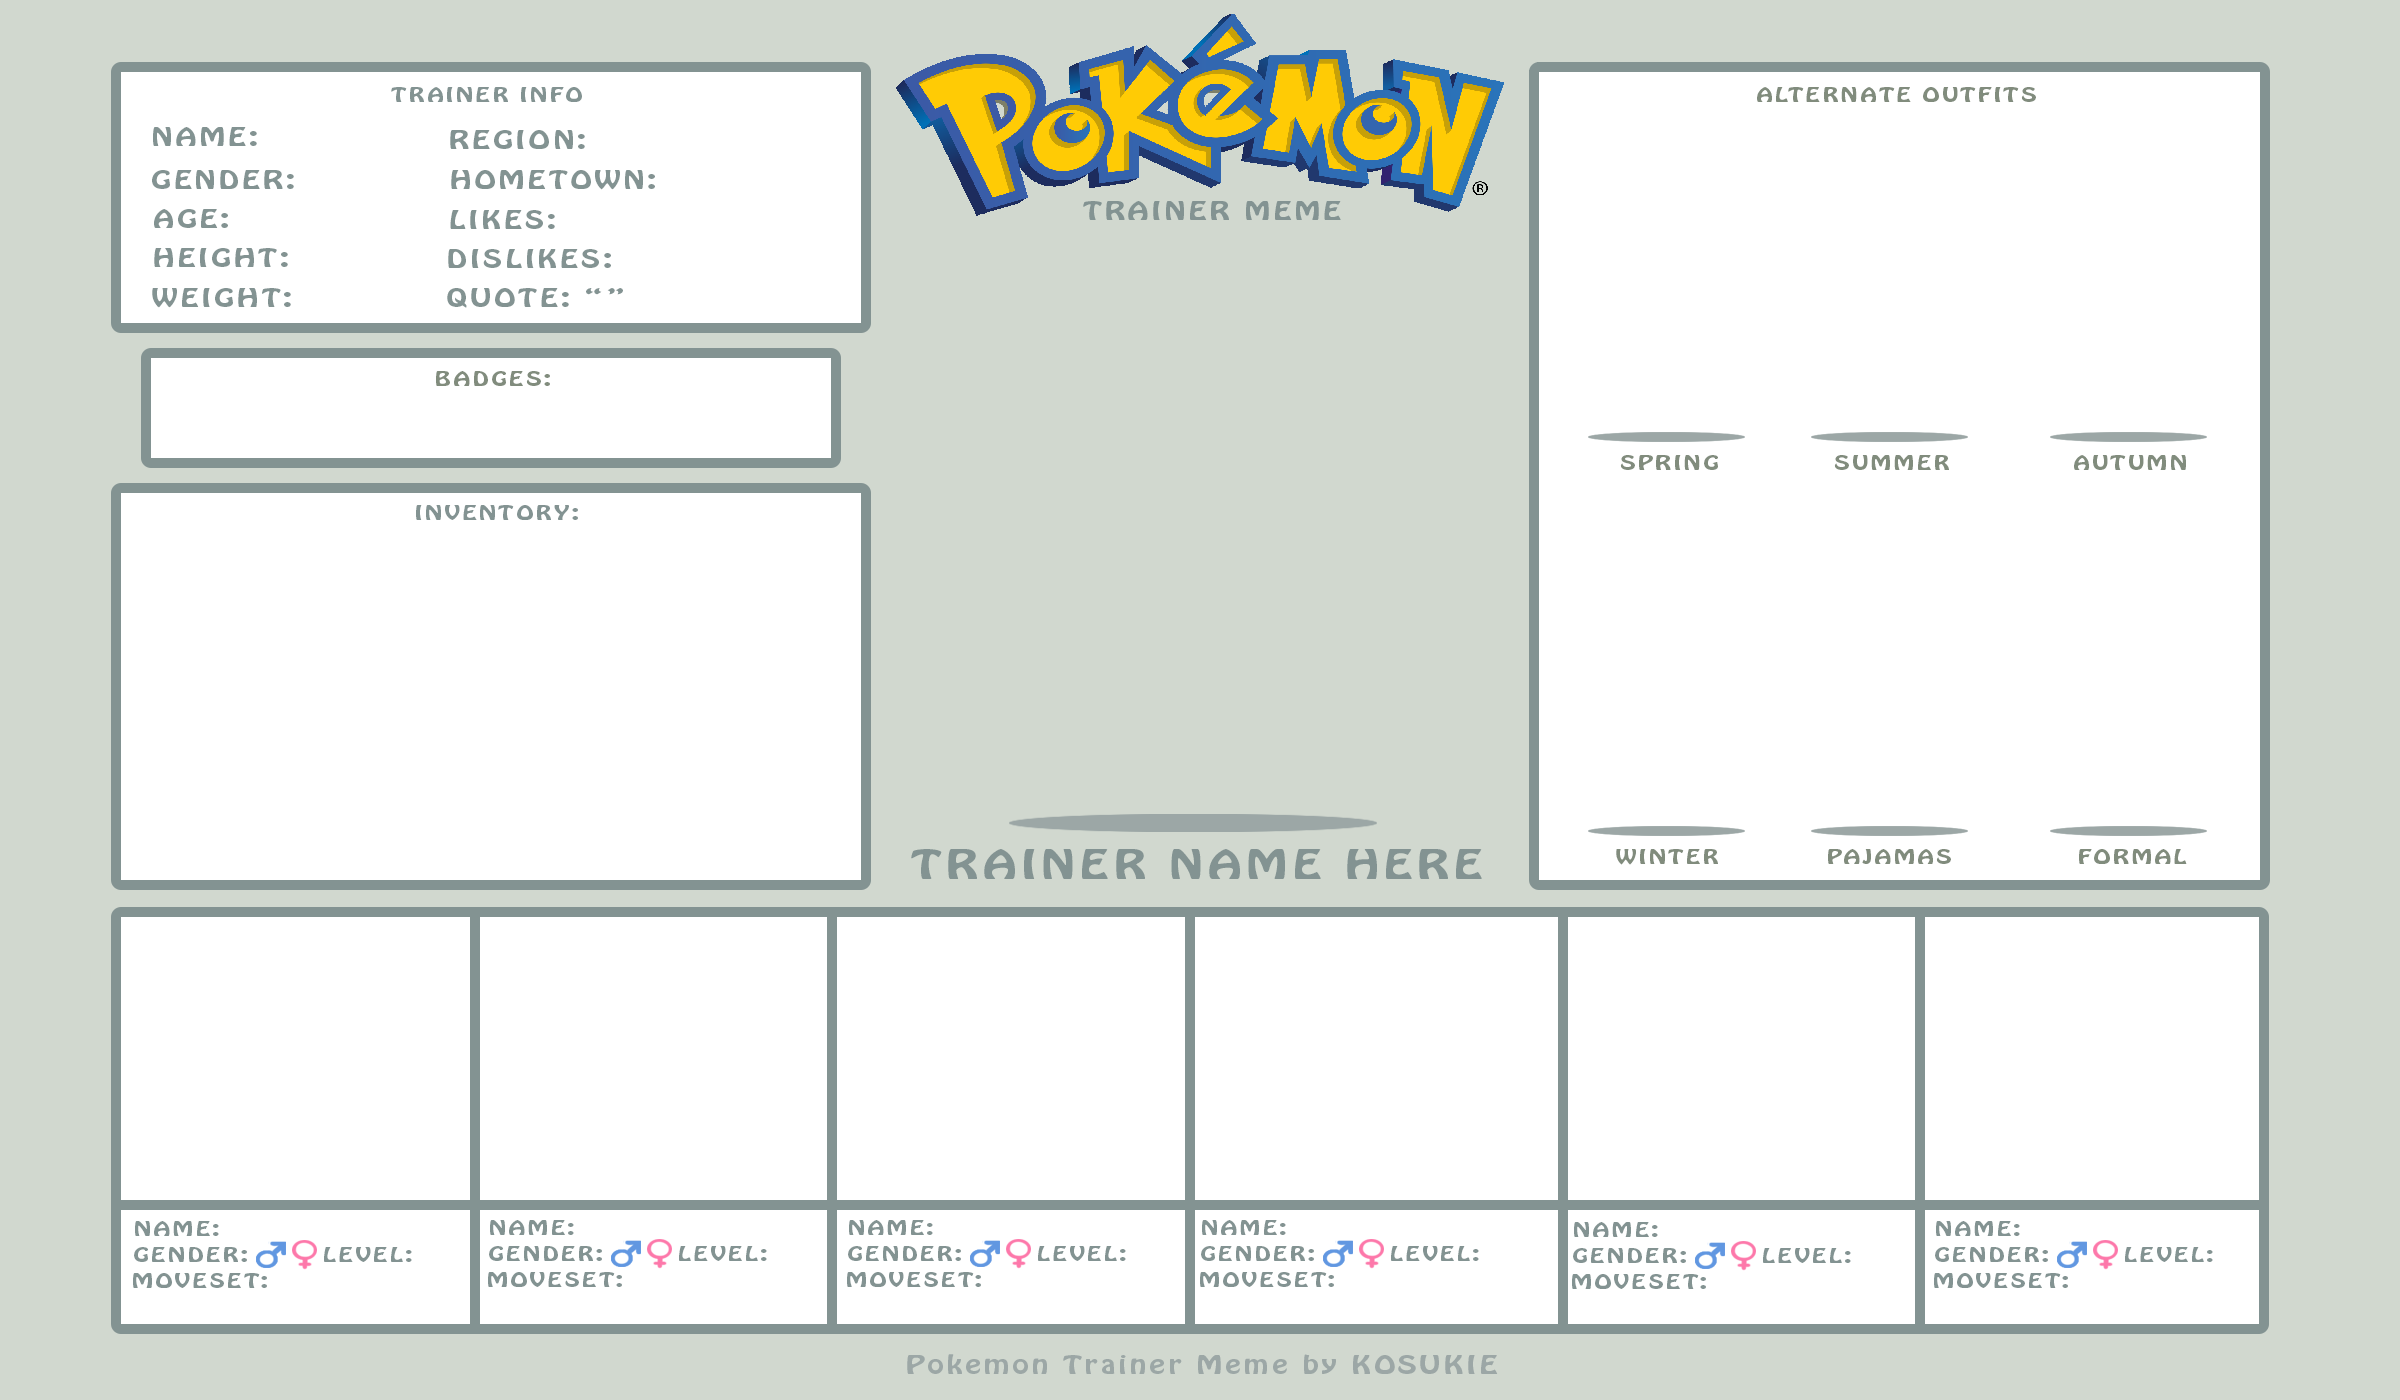 Pokemon Trainer Meme by Kosukie